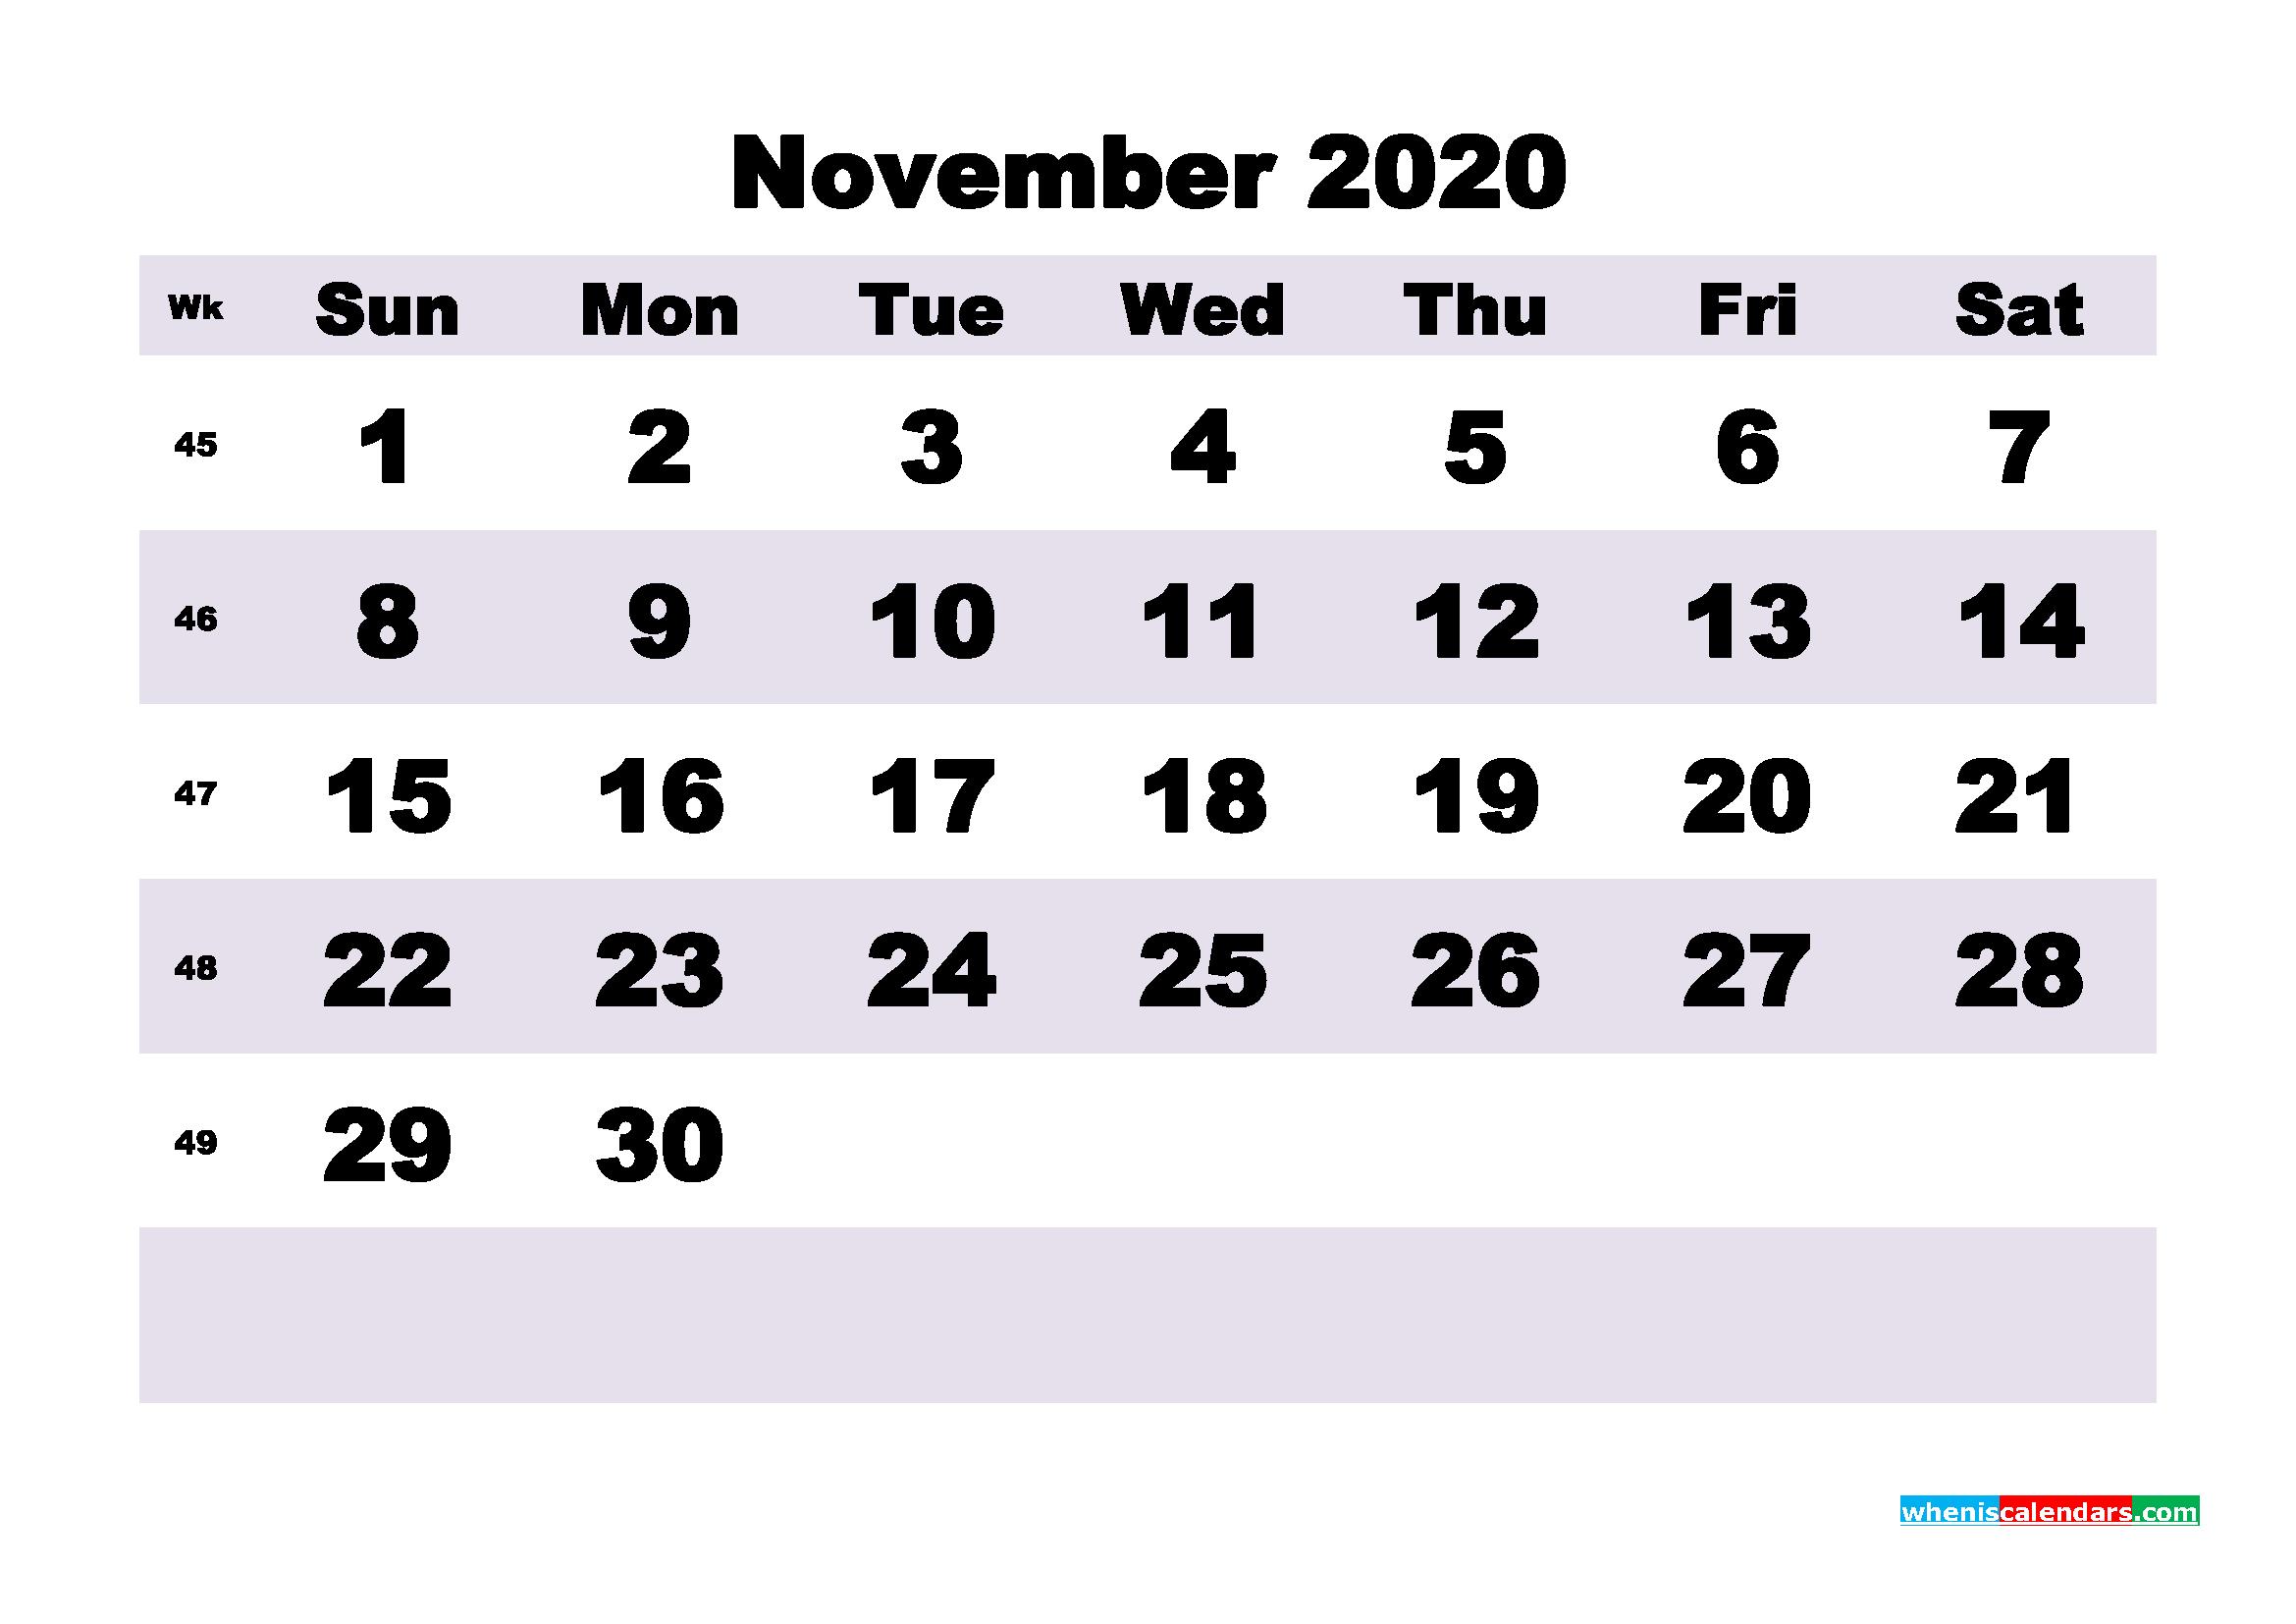 Blank November 2020 Calendar Printable - No.m20b203